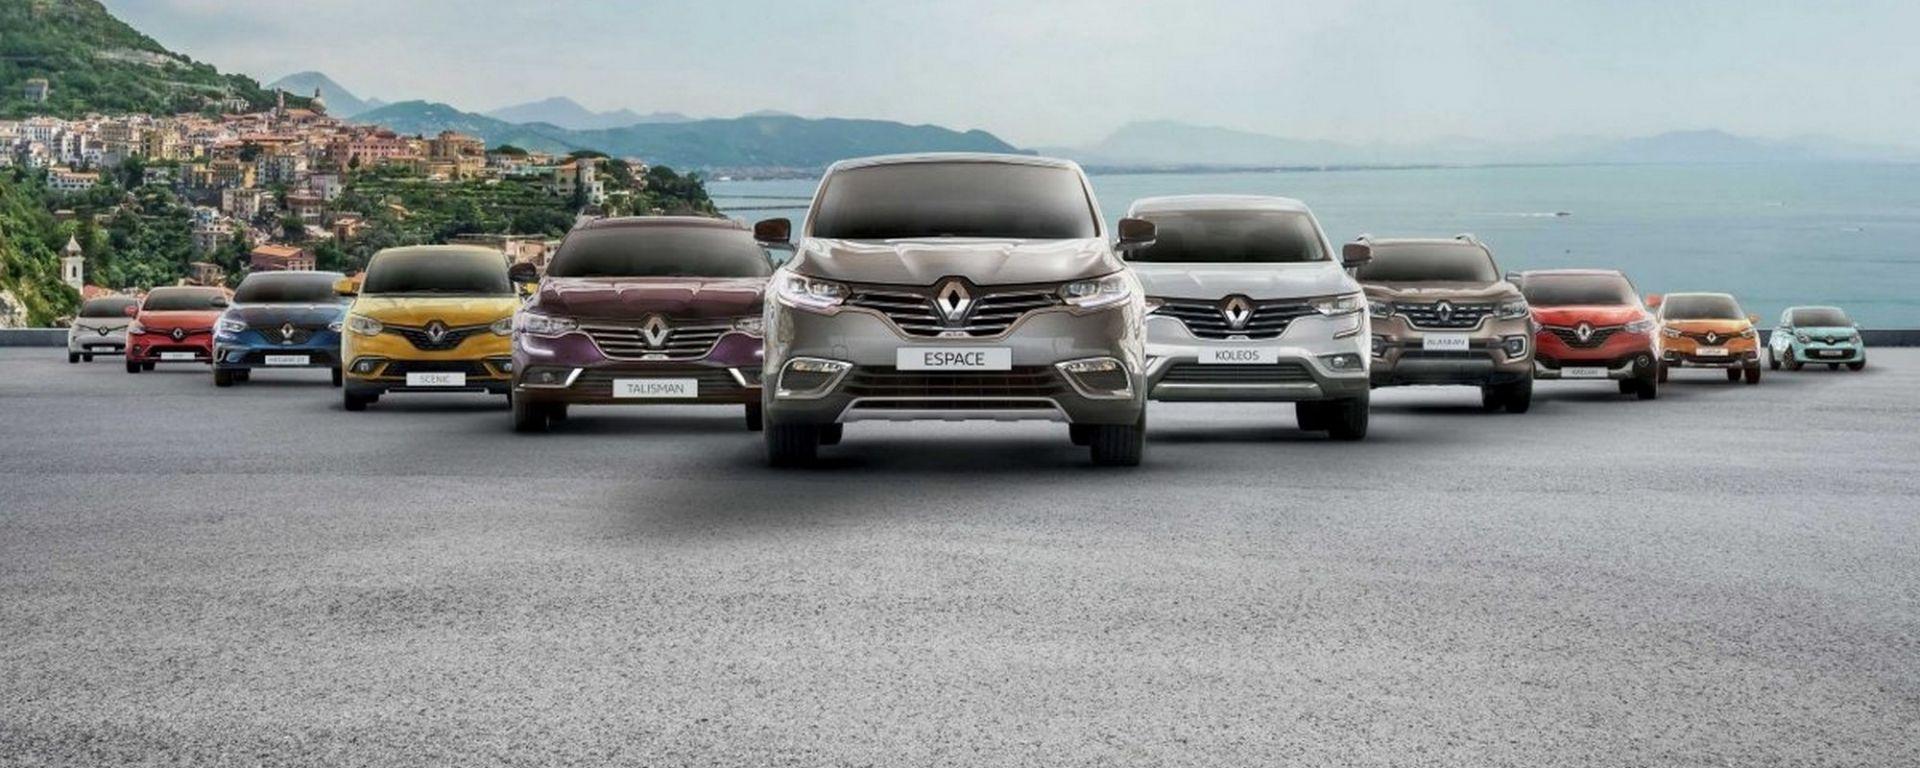 Vendite 2018: Renault-Nissan-Mitsubishi al vertice mondiale